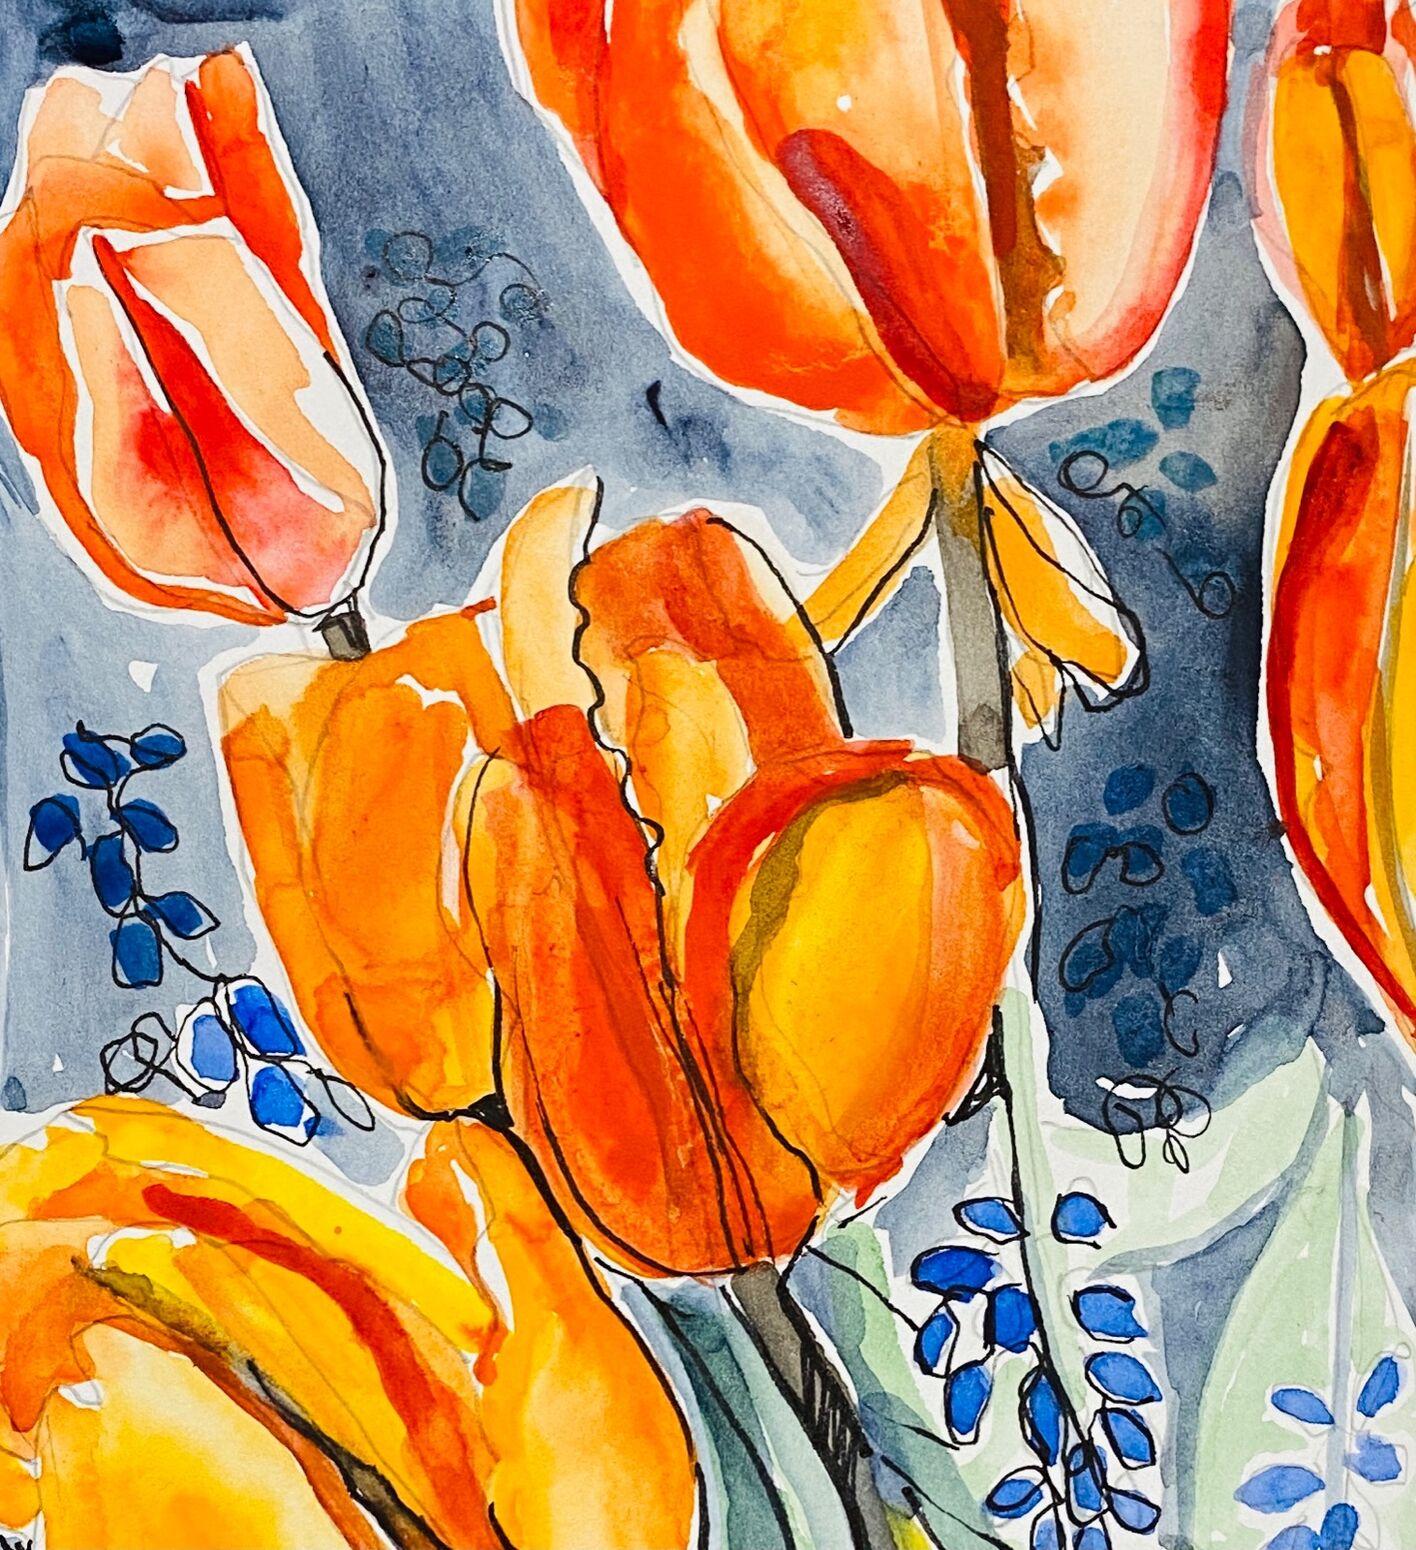 Red/yellow tulips